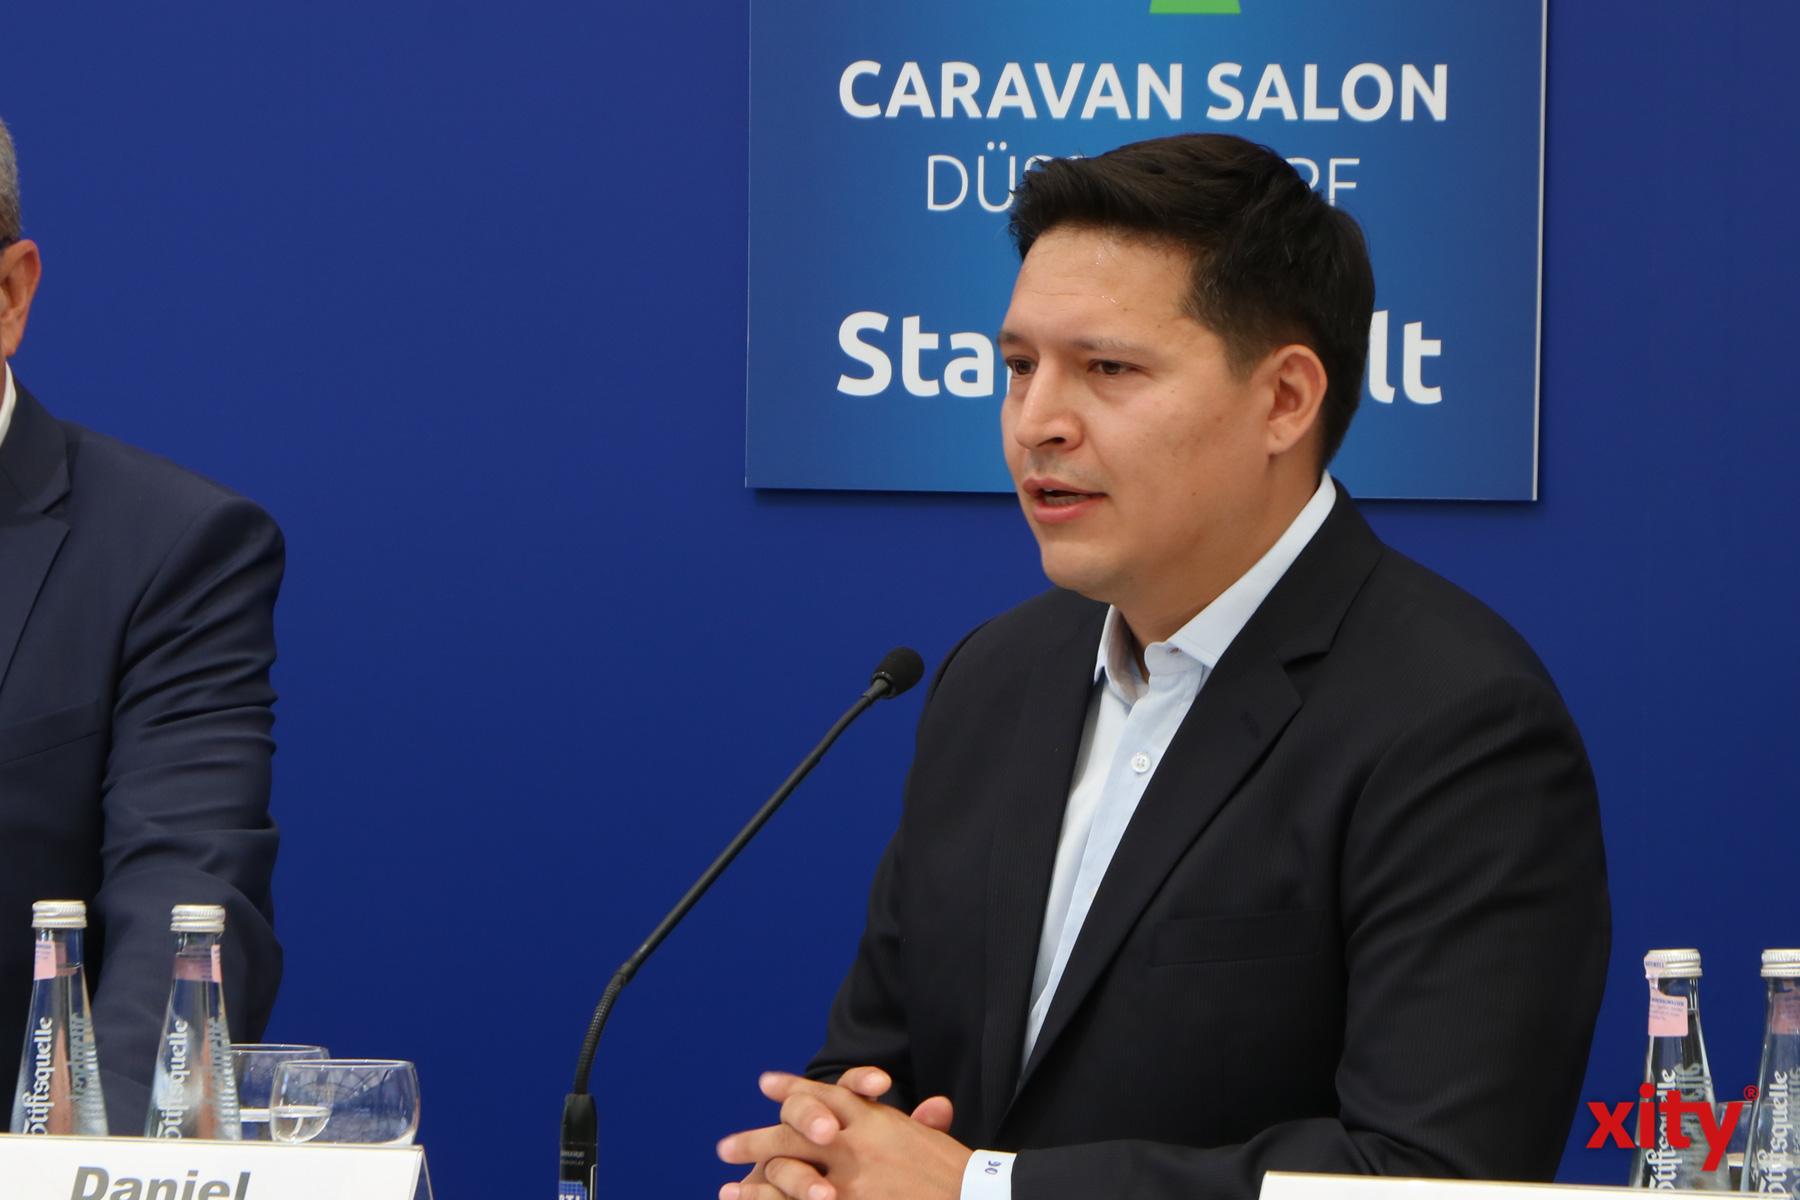 Daniel Onggowinarso, Geschäftsführer Caravaning Industrie Verband e.V. (Foto: xity)